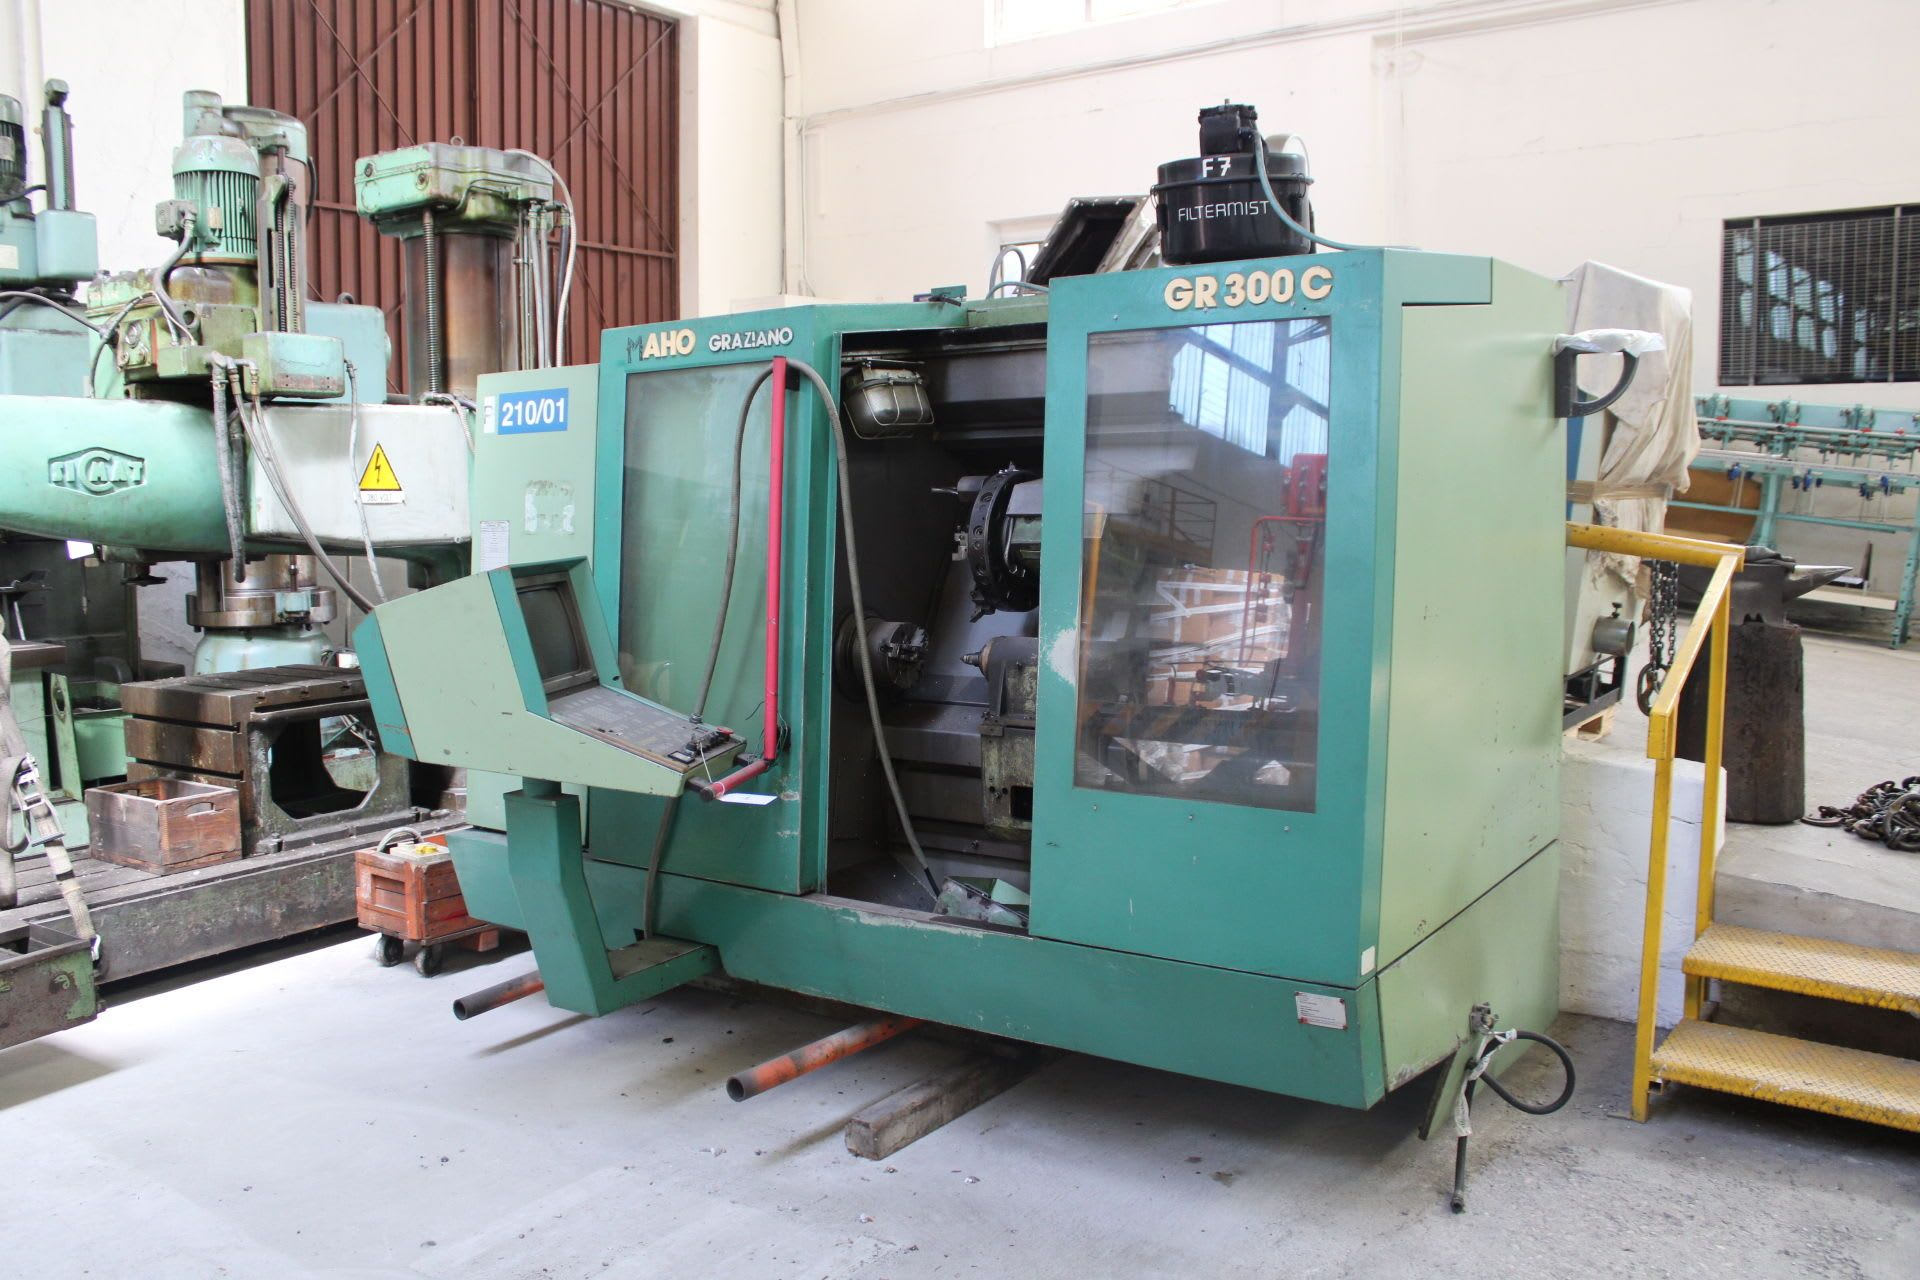 GRAZIANO GR300C CNC-Drehmaschine